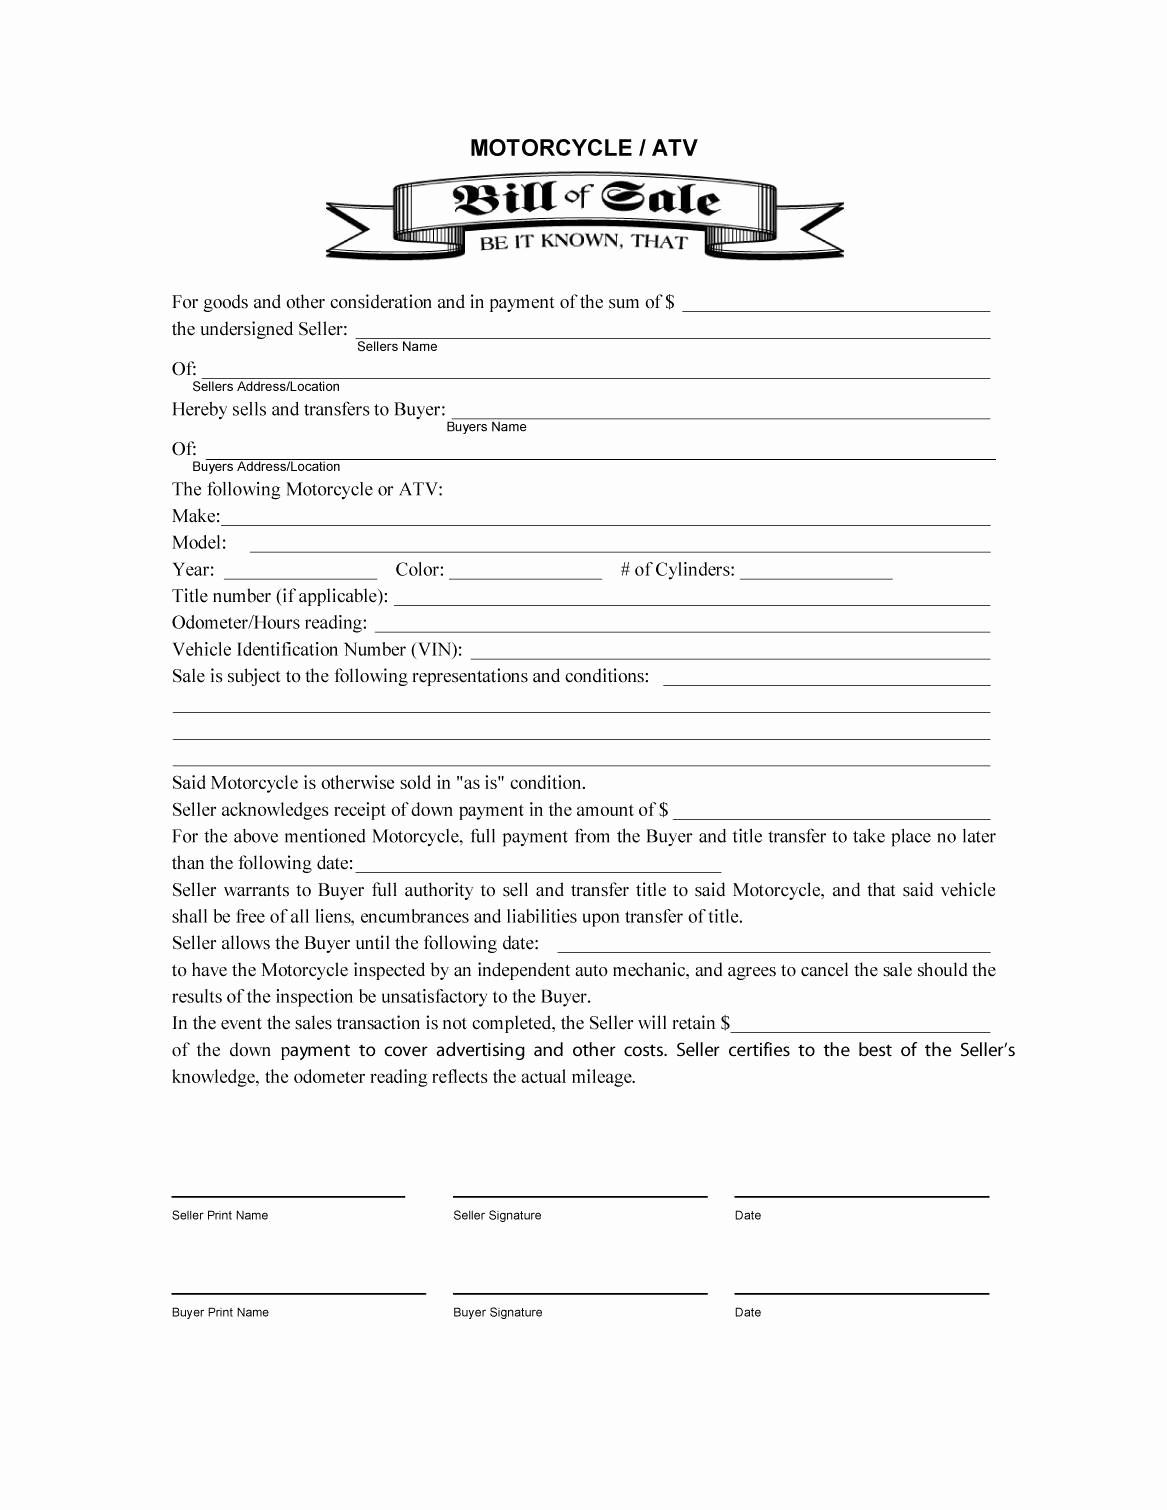 Bill Of Sale Printable Free Elegant 45 Fee Printable Bill Of Sale Templates Car Boat Gun